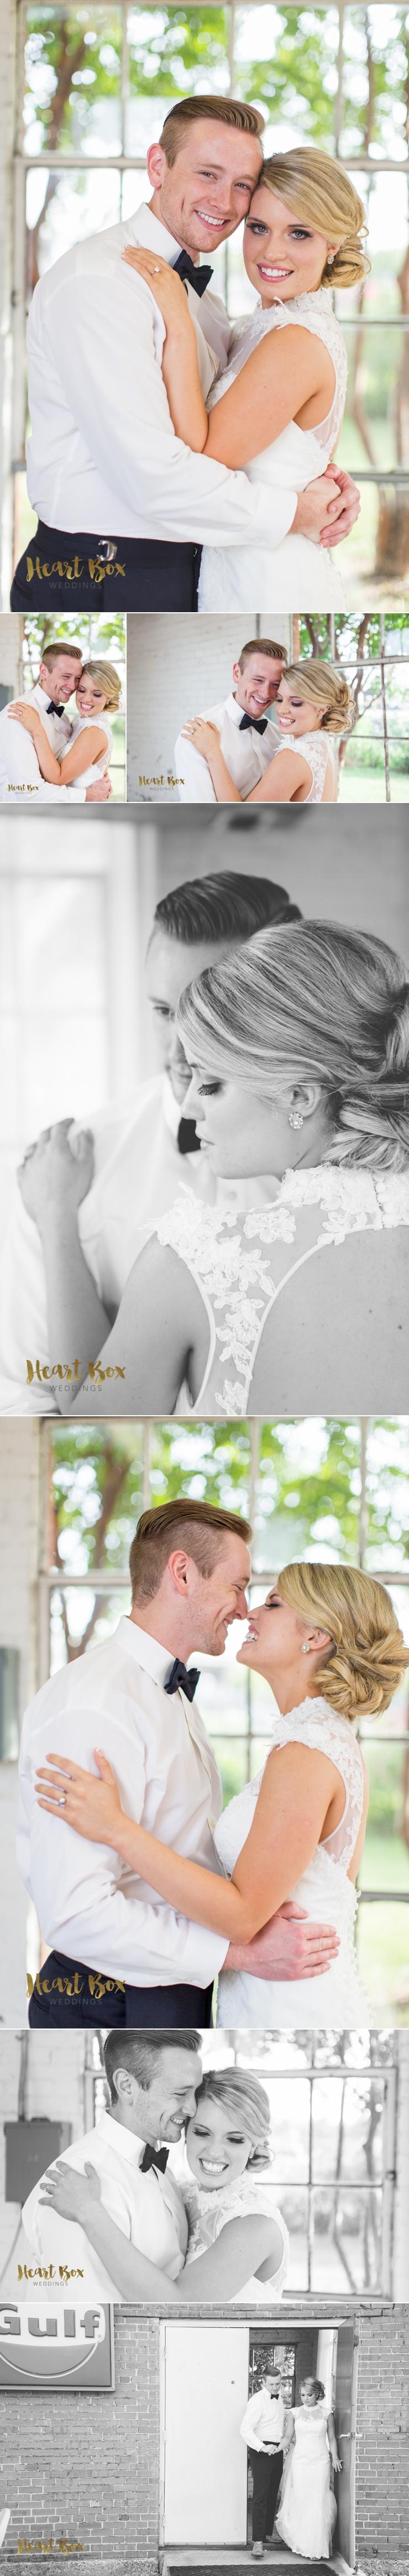 Mabry Wedding 9.jpg